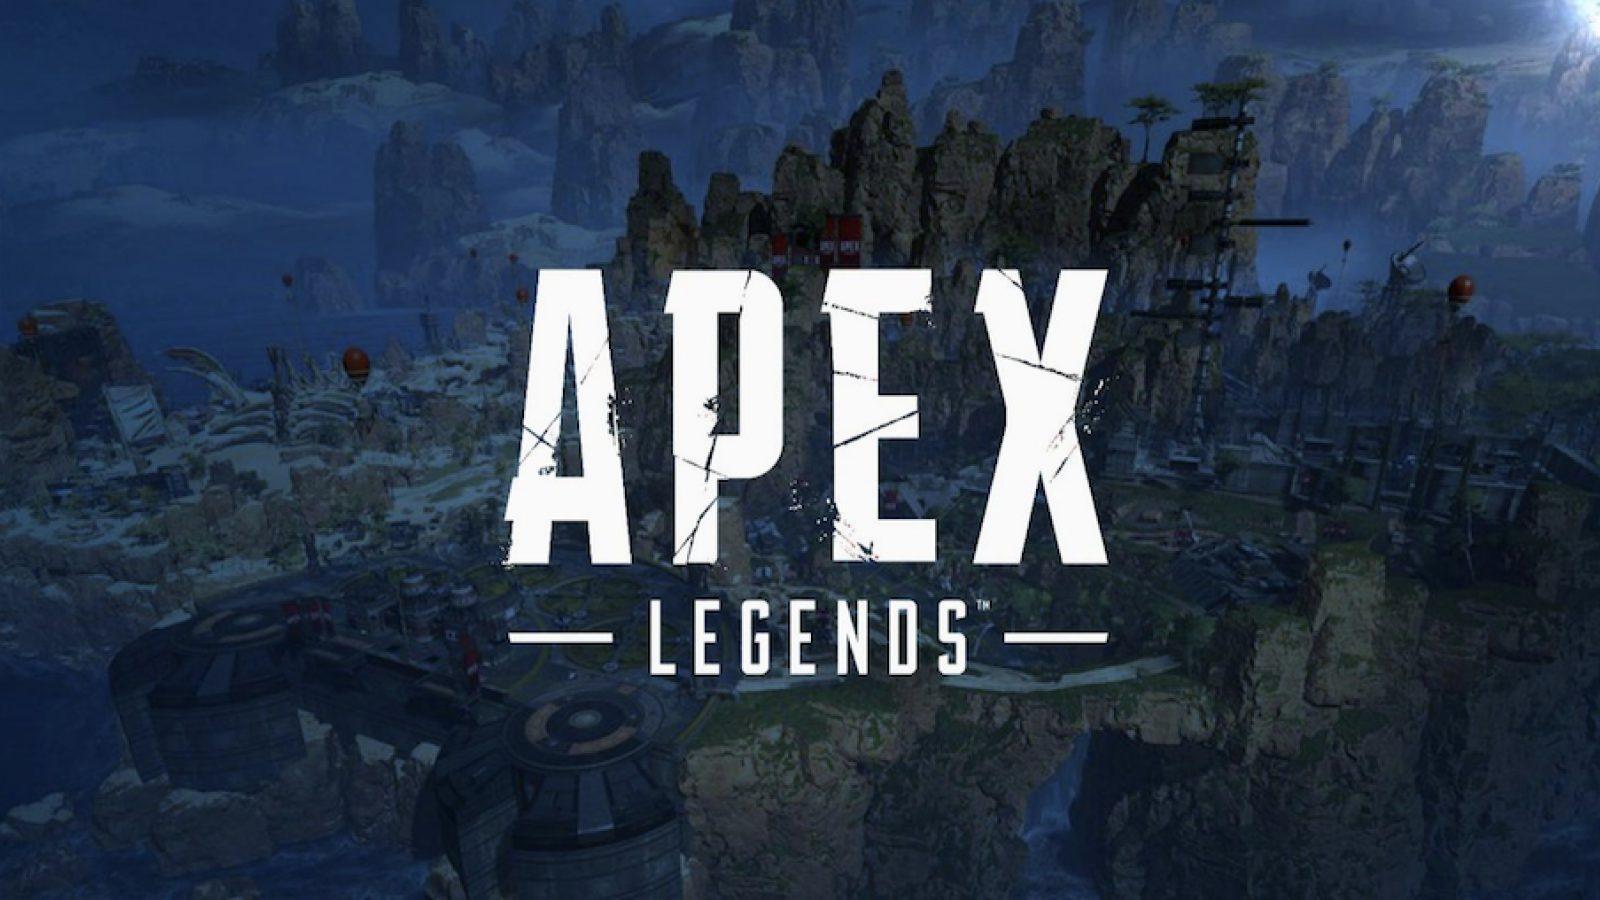 apex legend logo wallpapers